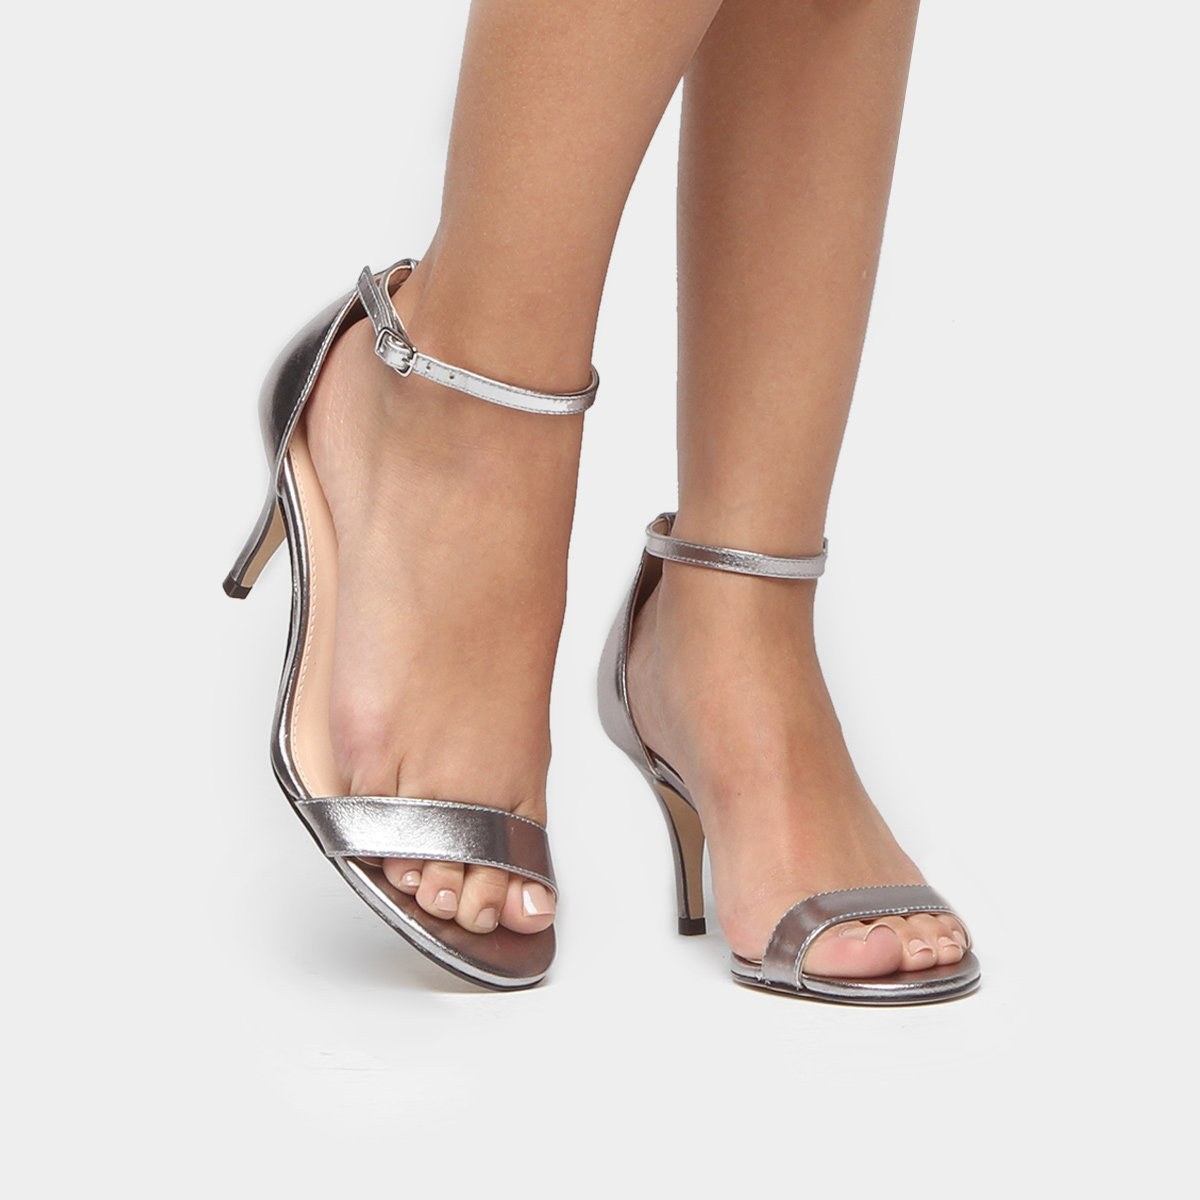 88e858e4e Sandália Couro Shoestock Salto Fino Metalizada Feminina - Prata | Shoestock